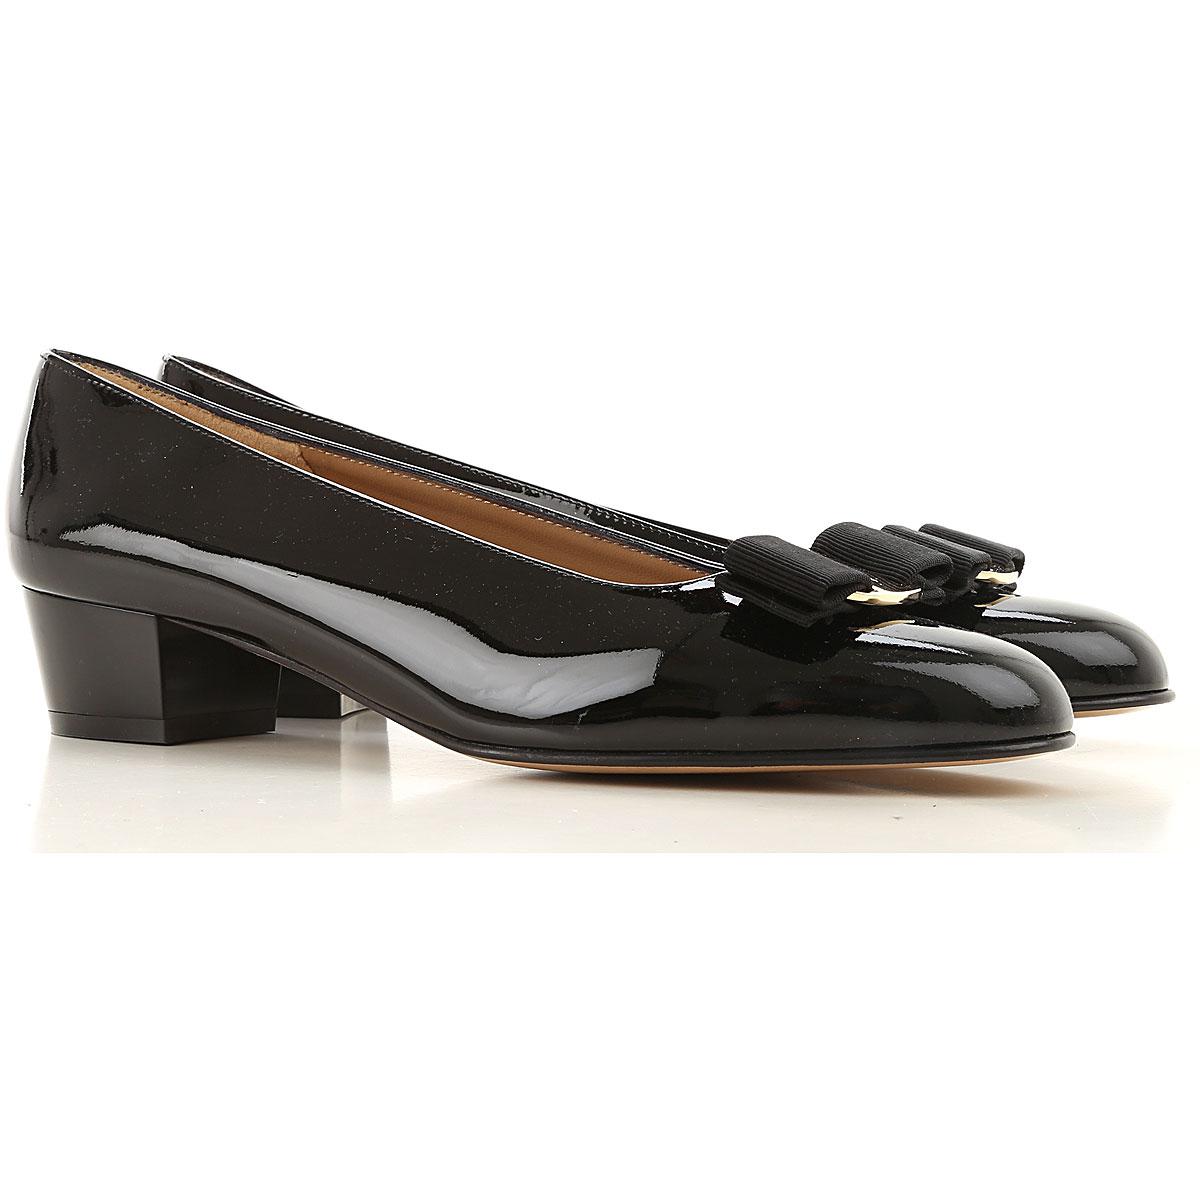 Salvatore Ferragamo Ballet Flats Ballerina Shoes for Women On Sale, Black, Patent Leather, 2019, 5.5 6